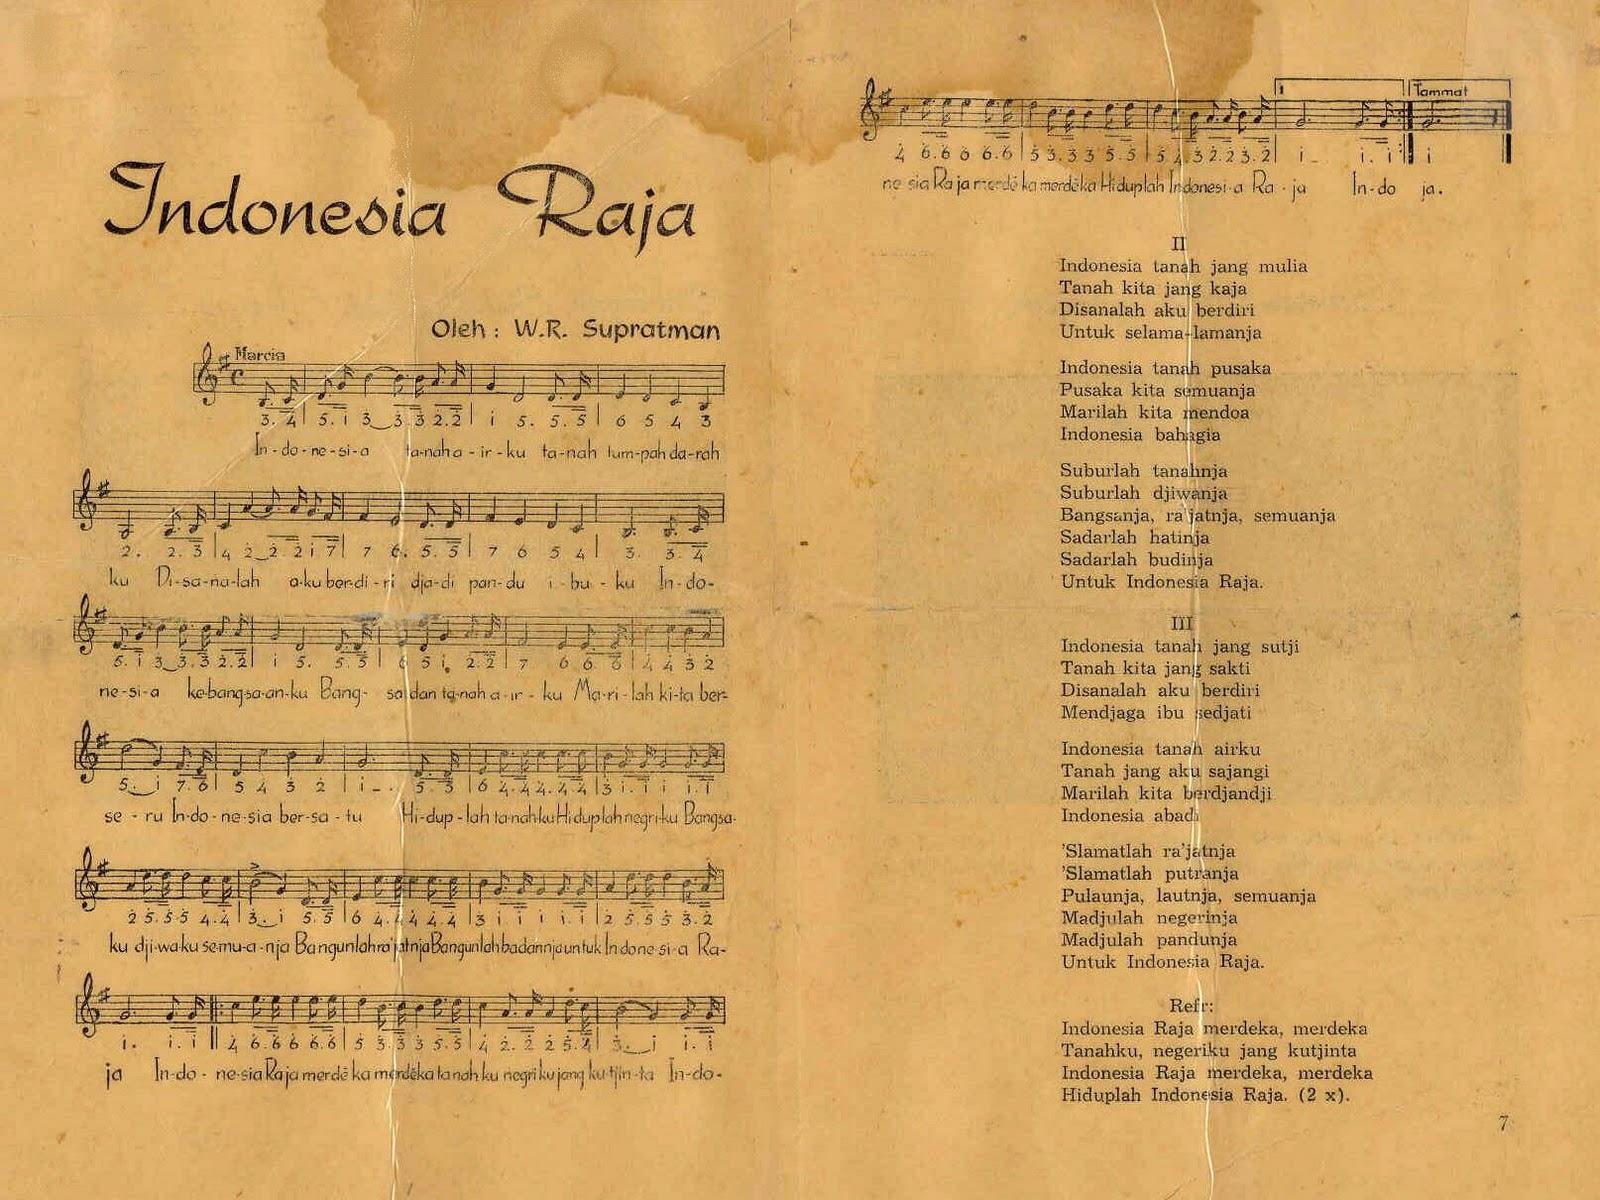 Lirik Indonesia Raya 3 Stanza Lirik Asli Ejaan 1958 Dan Eyd Ejaan Yang Disempurnakan Lirikaz 09